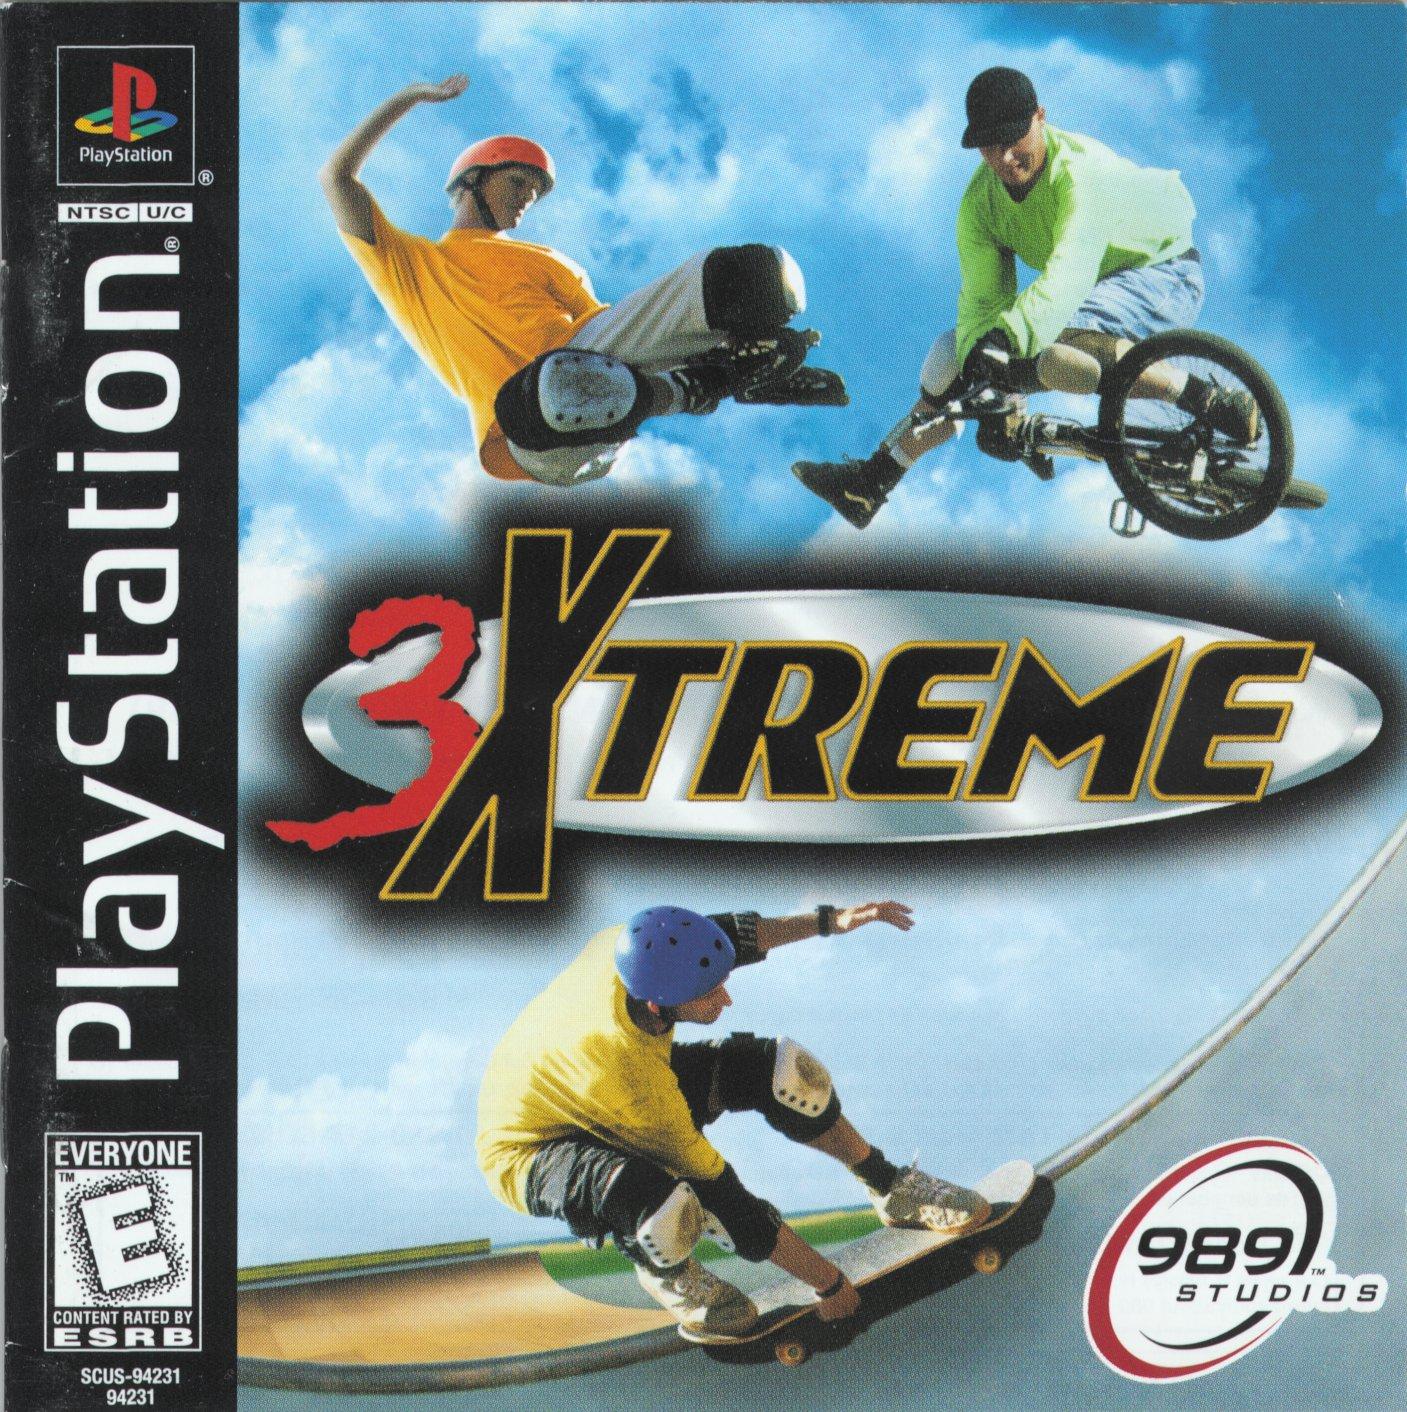 3Xtreme [SCUS-94231]